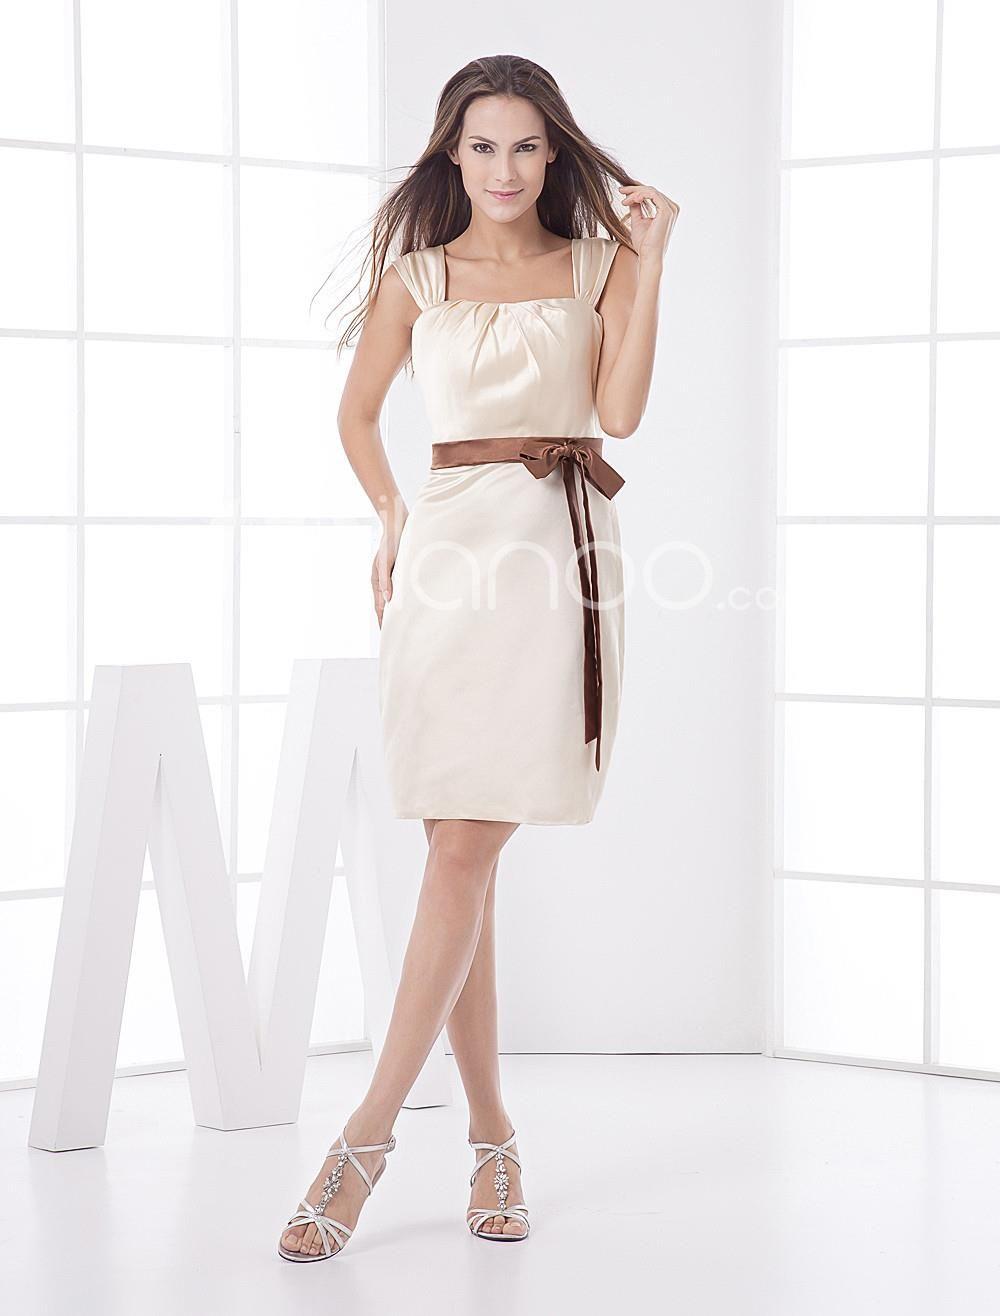 Aline champagne sash satin bridesmaid dress show off your curves